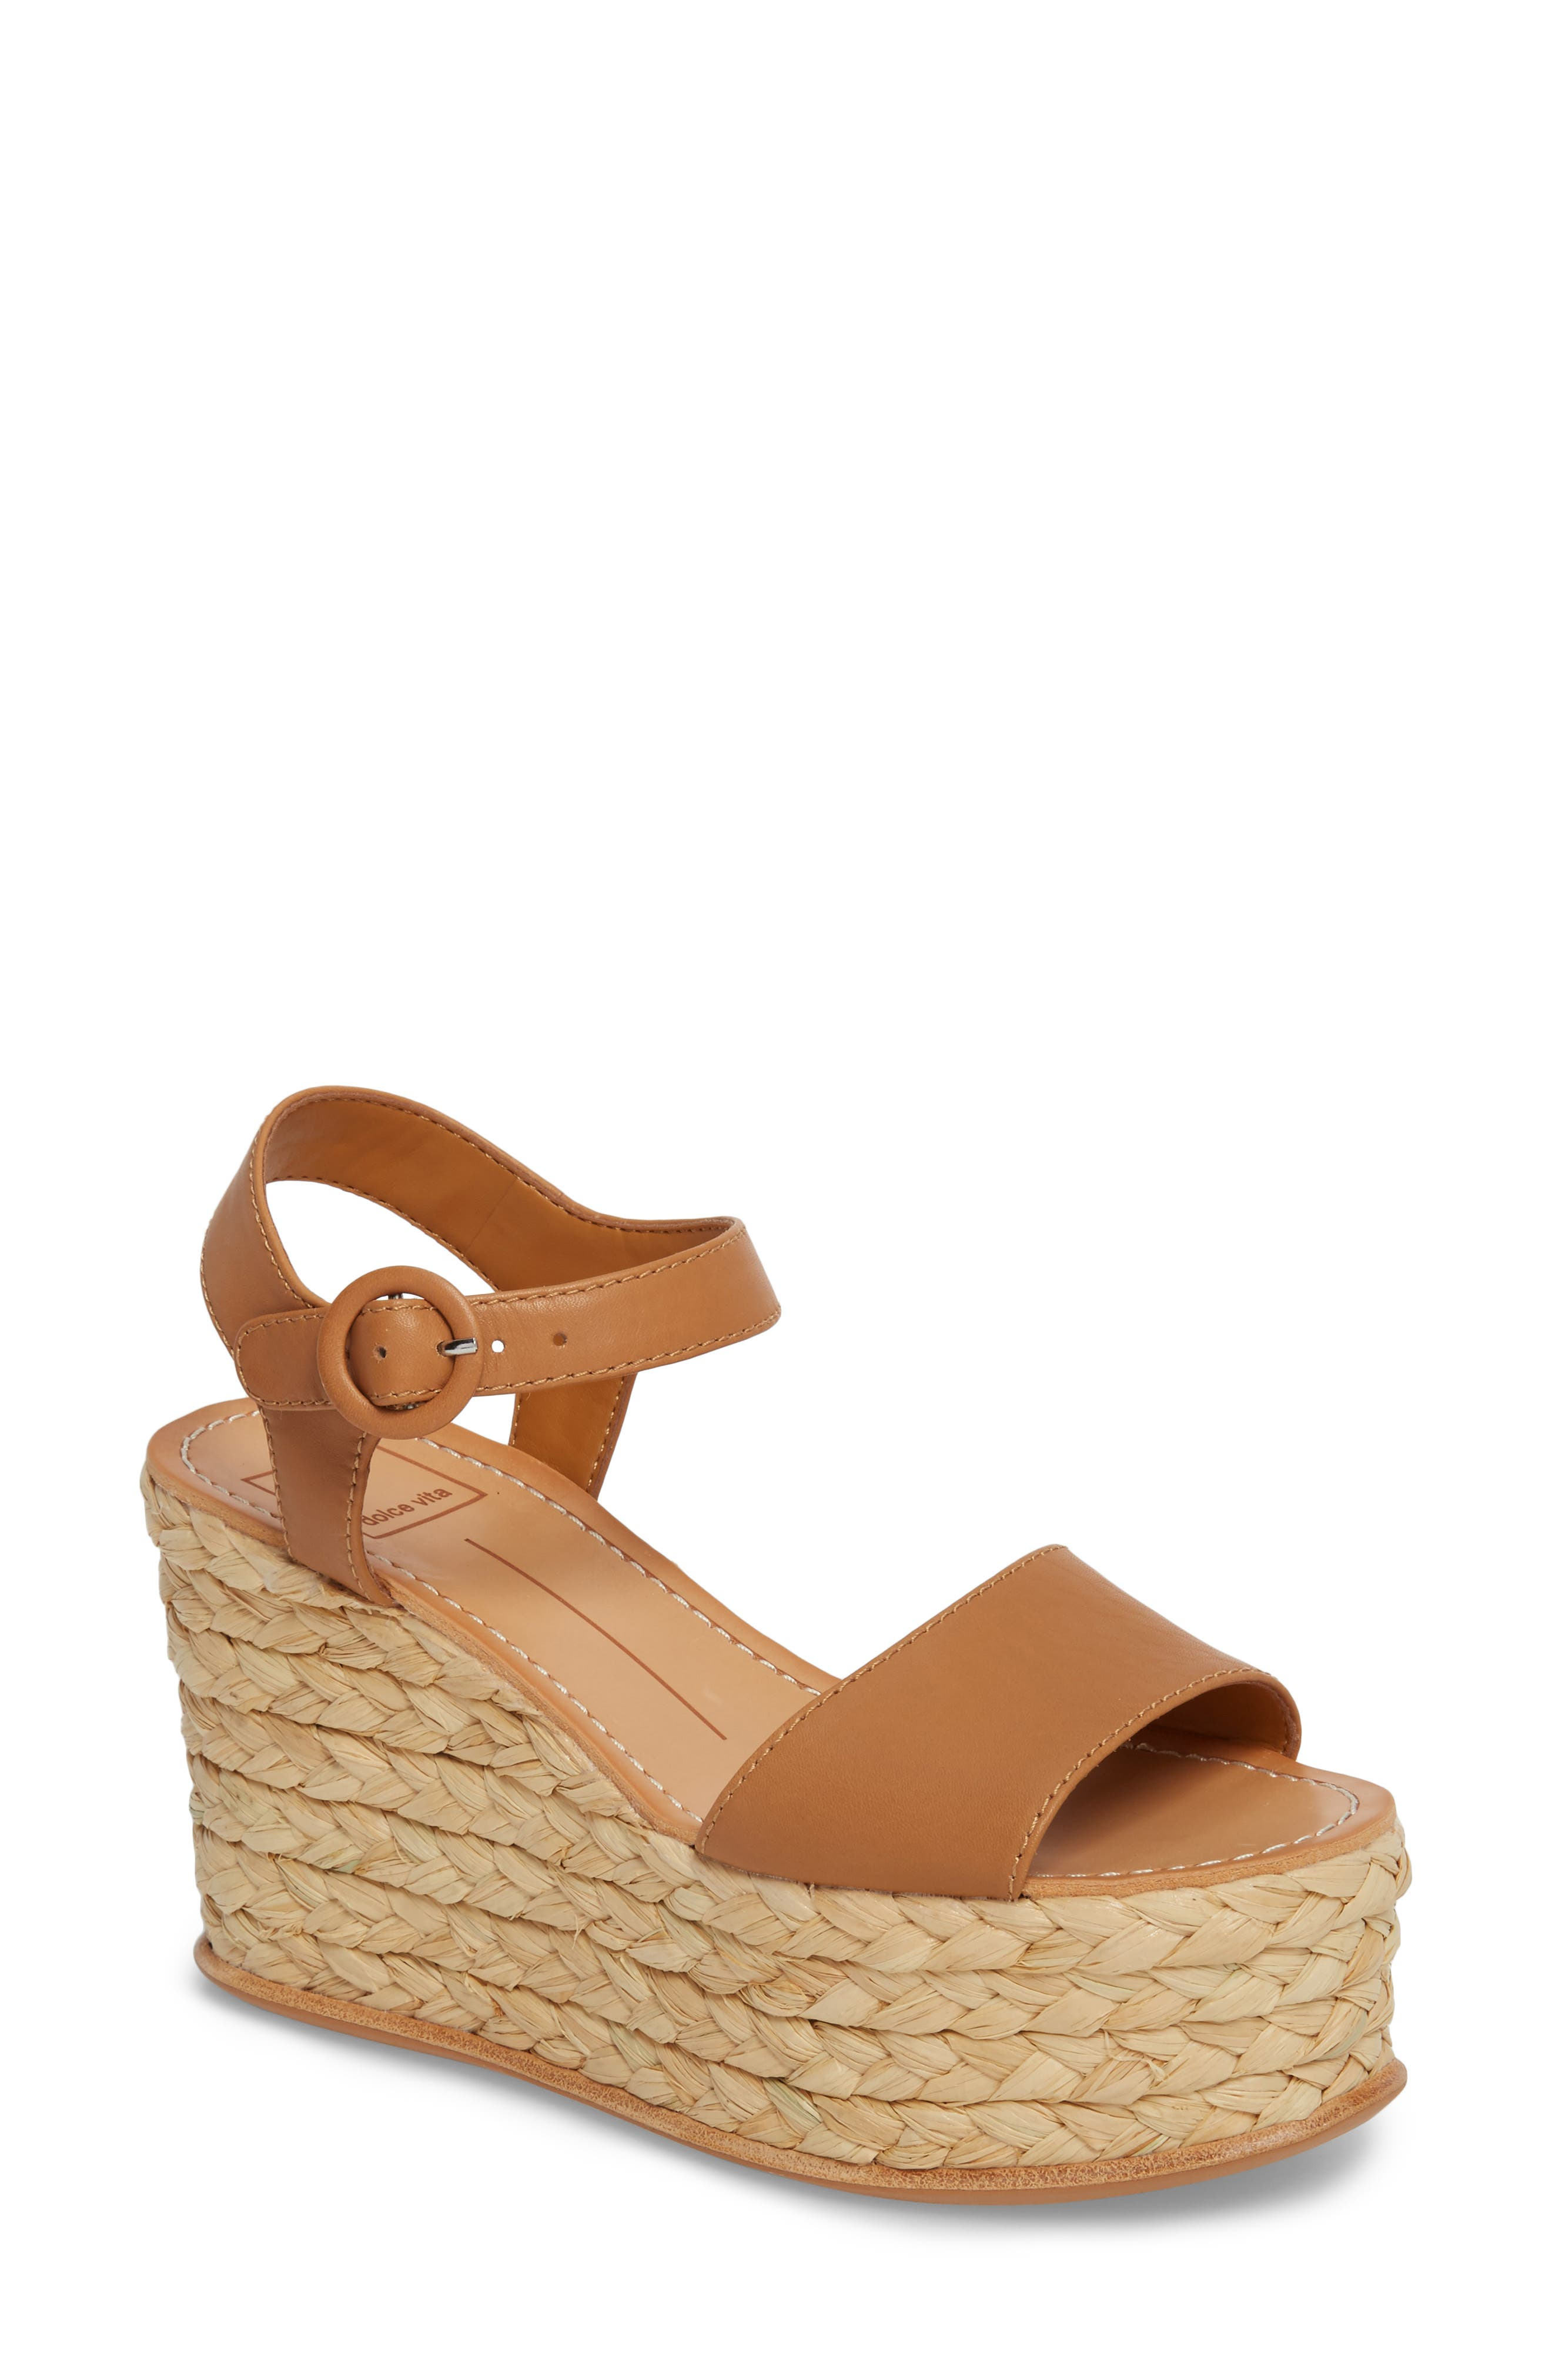 Dolce Vita Dane Espadrille Wedge Sandal (Women)